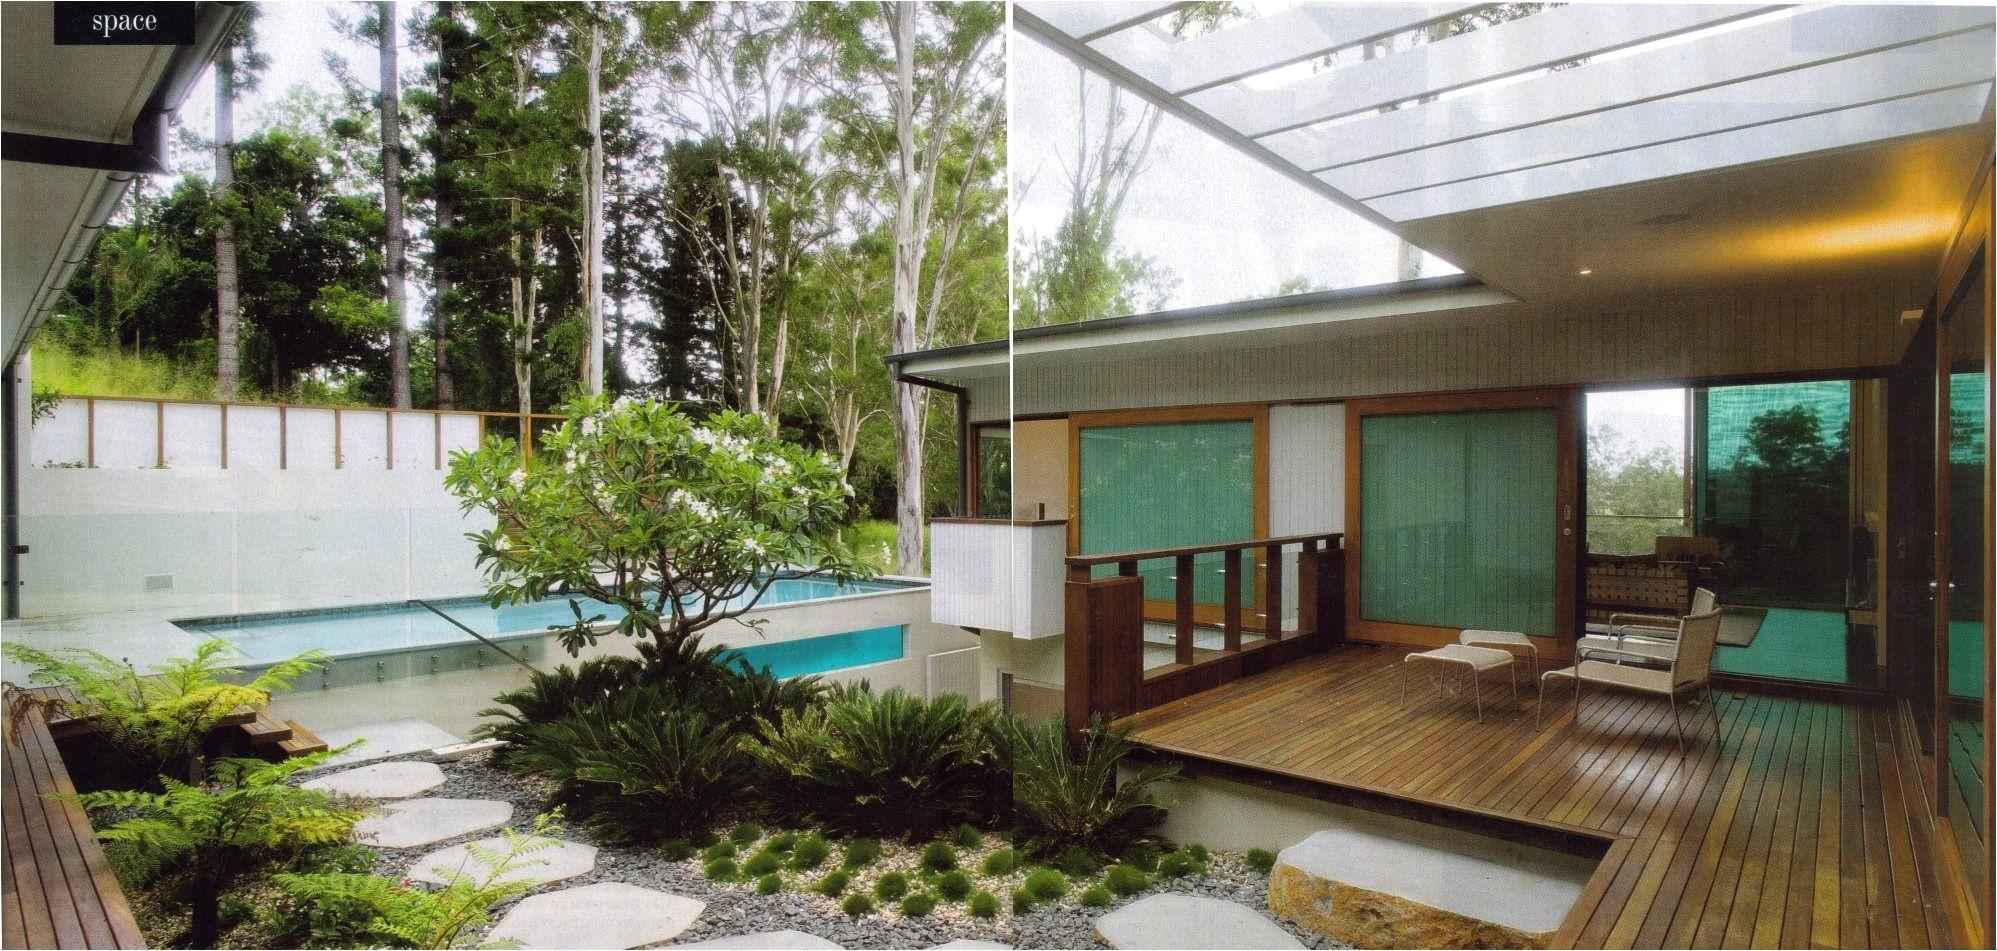 house plans with courtyards courtyard plan custom modern latest houses small garden design ideas